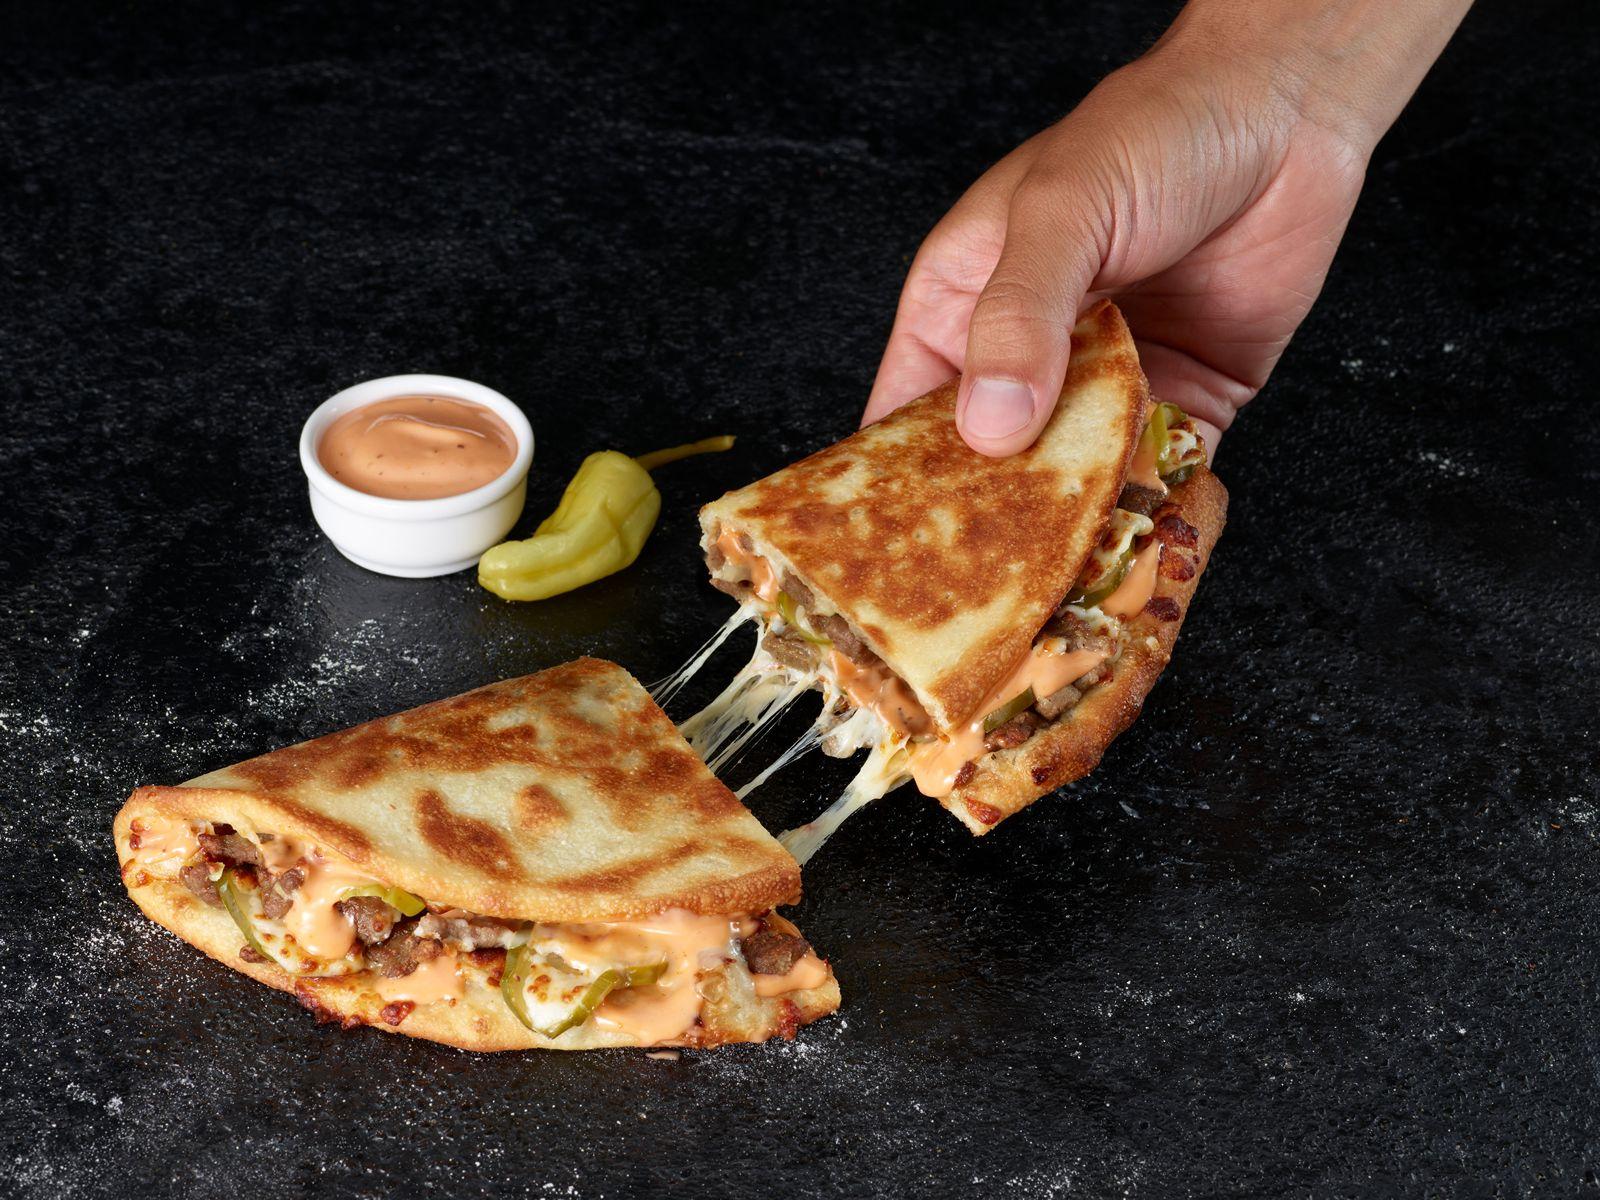 Papa John's Brings Back Its Fan-Favorite Double Cheeseburger Pizza